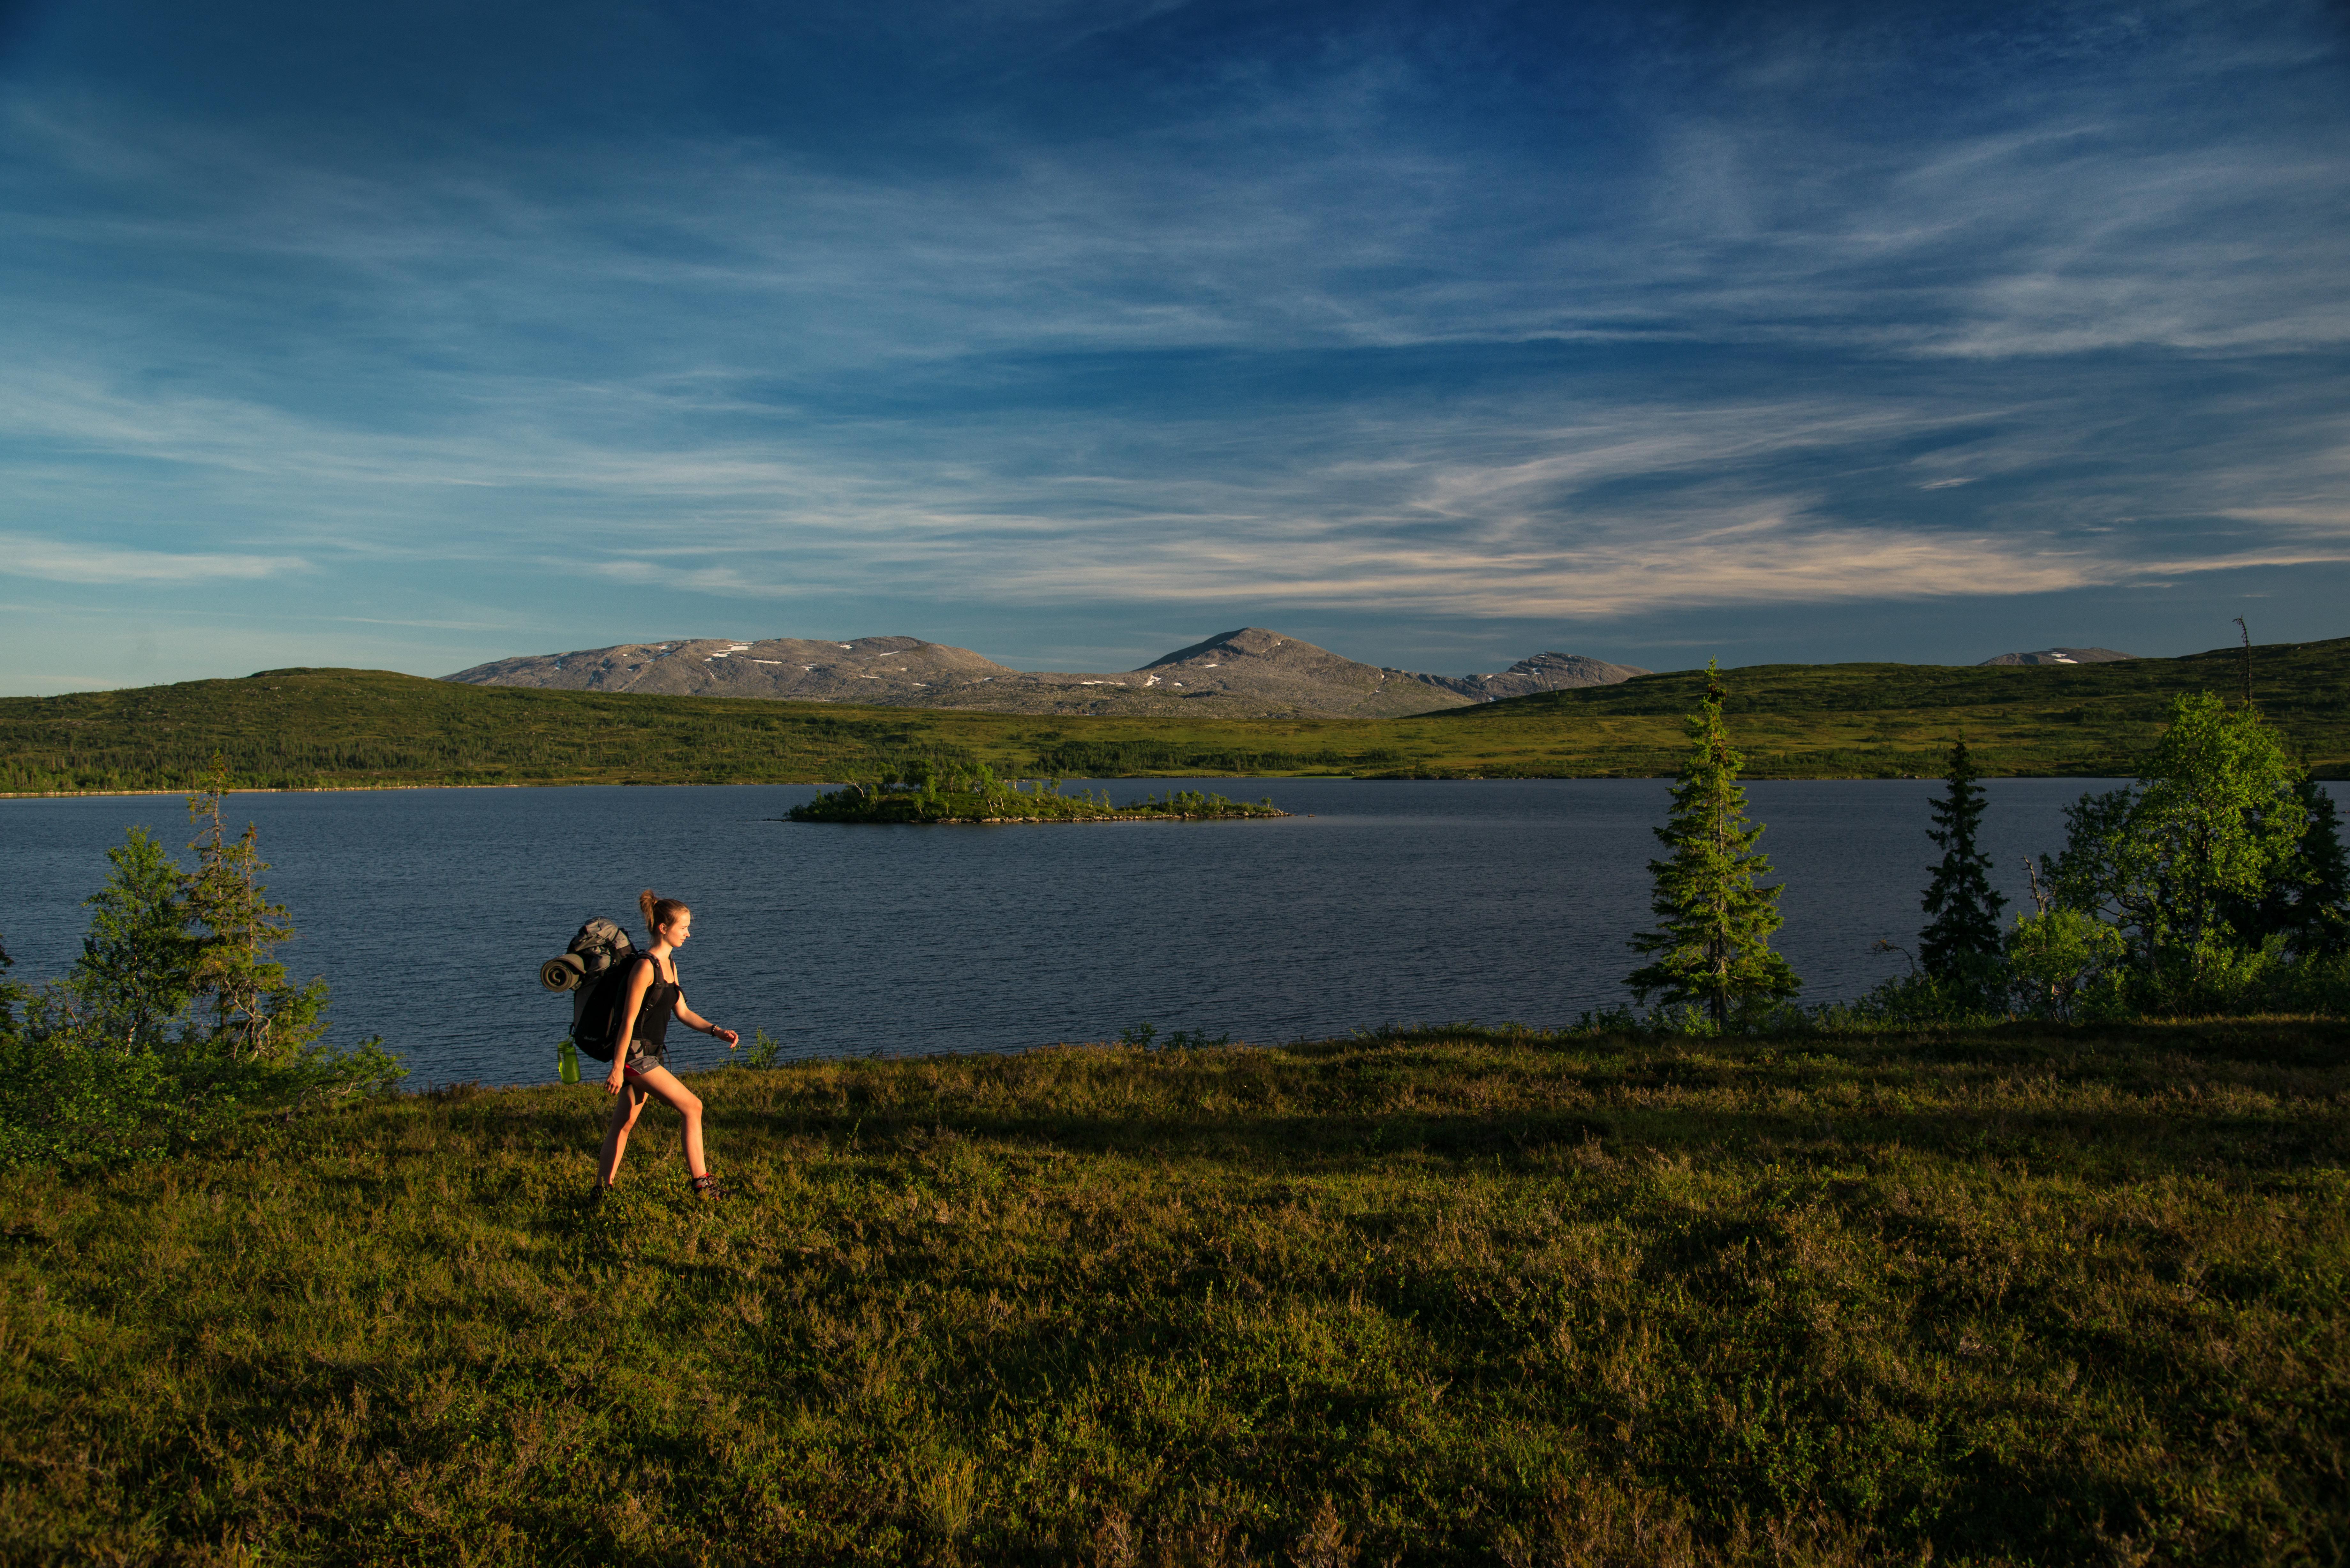 Lakavatnet i Blåfjella-Skjækerfjella. Lierne kommune, Namdalen, Trøndelag. Foto: Bernartwood/trondelag.com